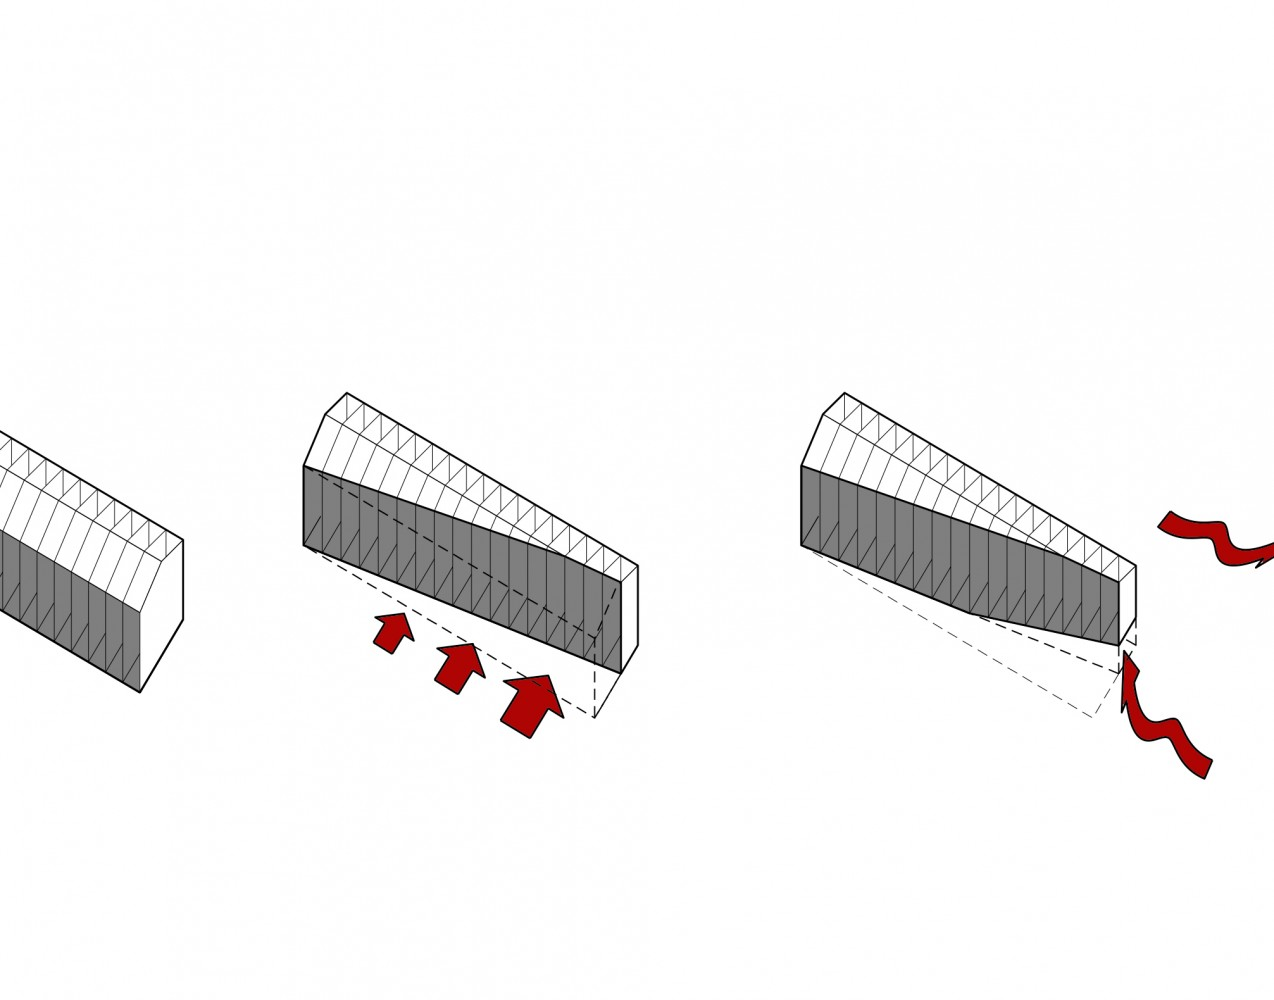 diagram-1274x1000.jpg